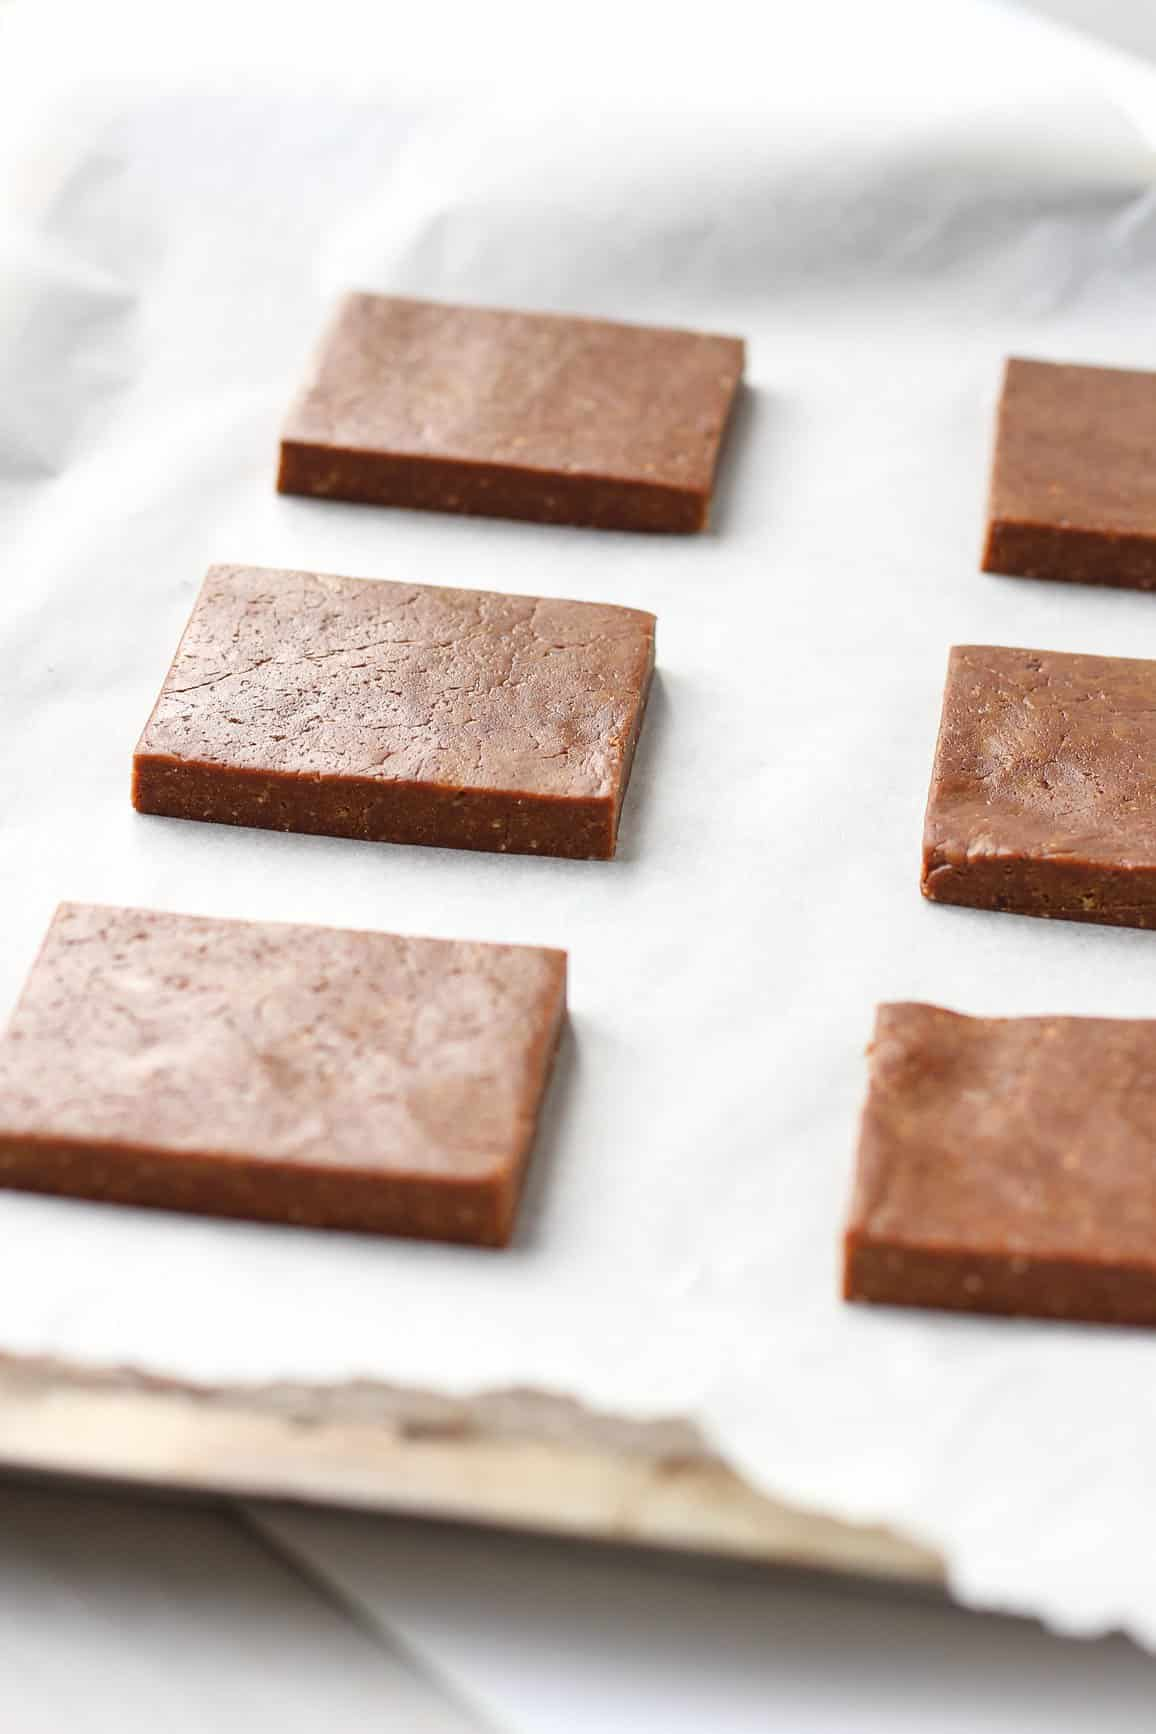 Chocolate Coated Protein Bar